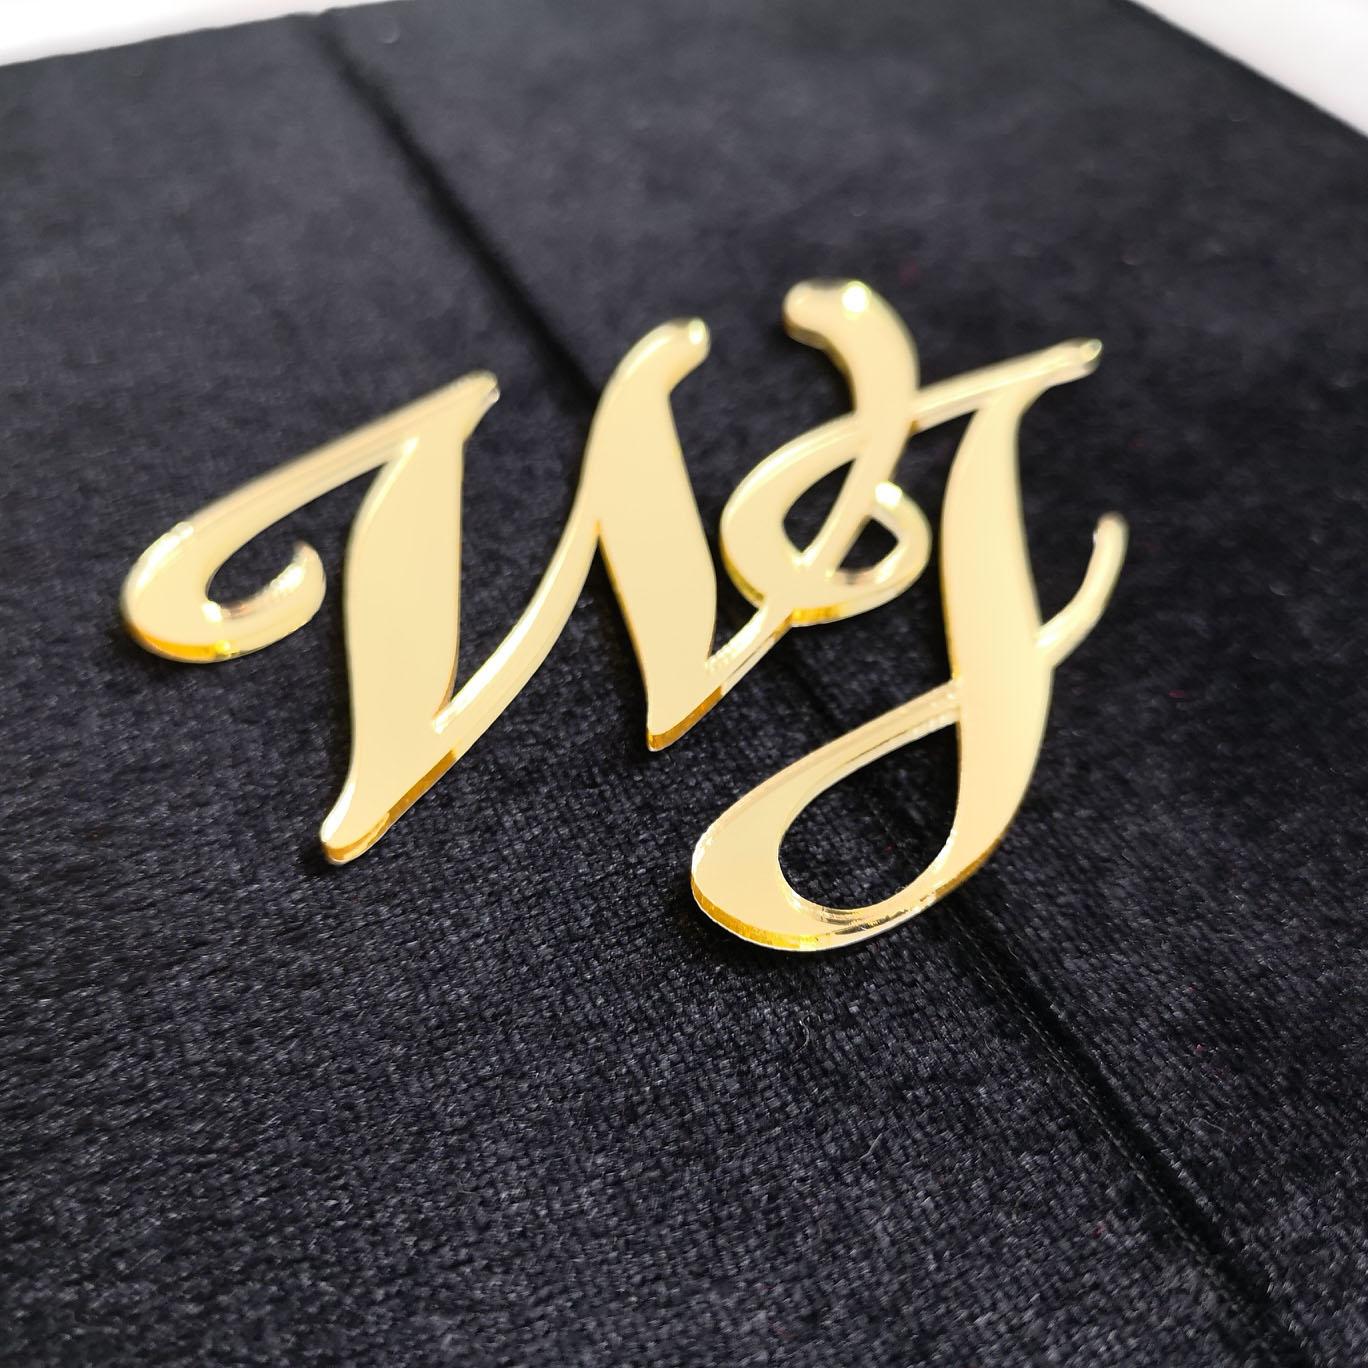 Beautiful Black Velvet Invitation Folder With Large Golden Laser Cut  Monogram - Luxury Wedding Invitations, Handmade Invitations & Wedding Favors